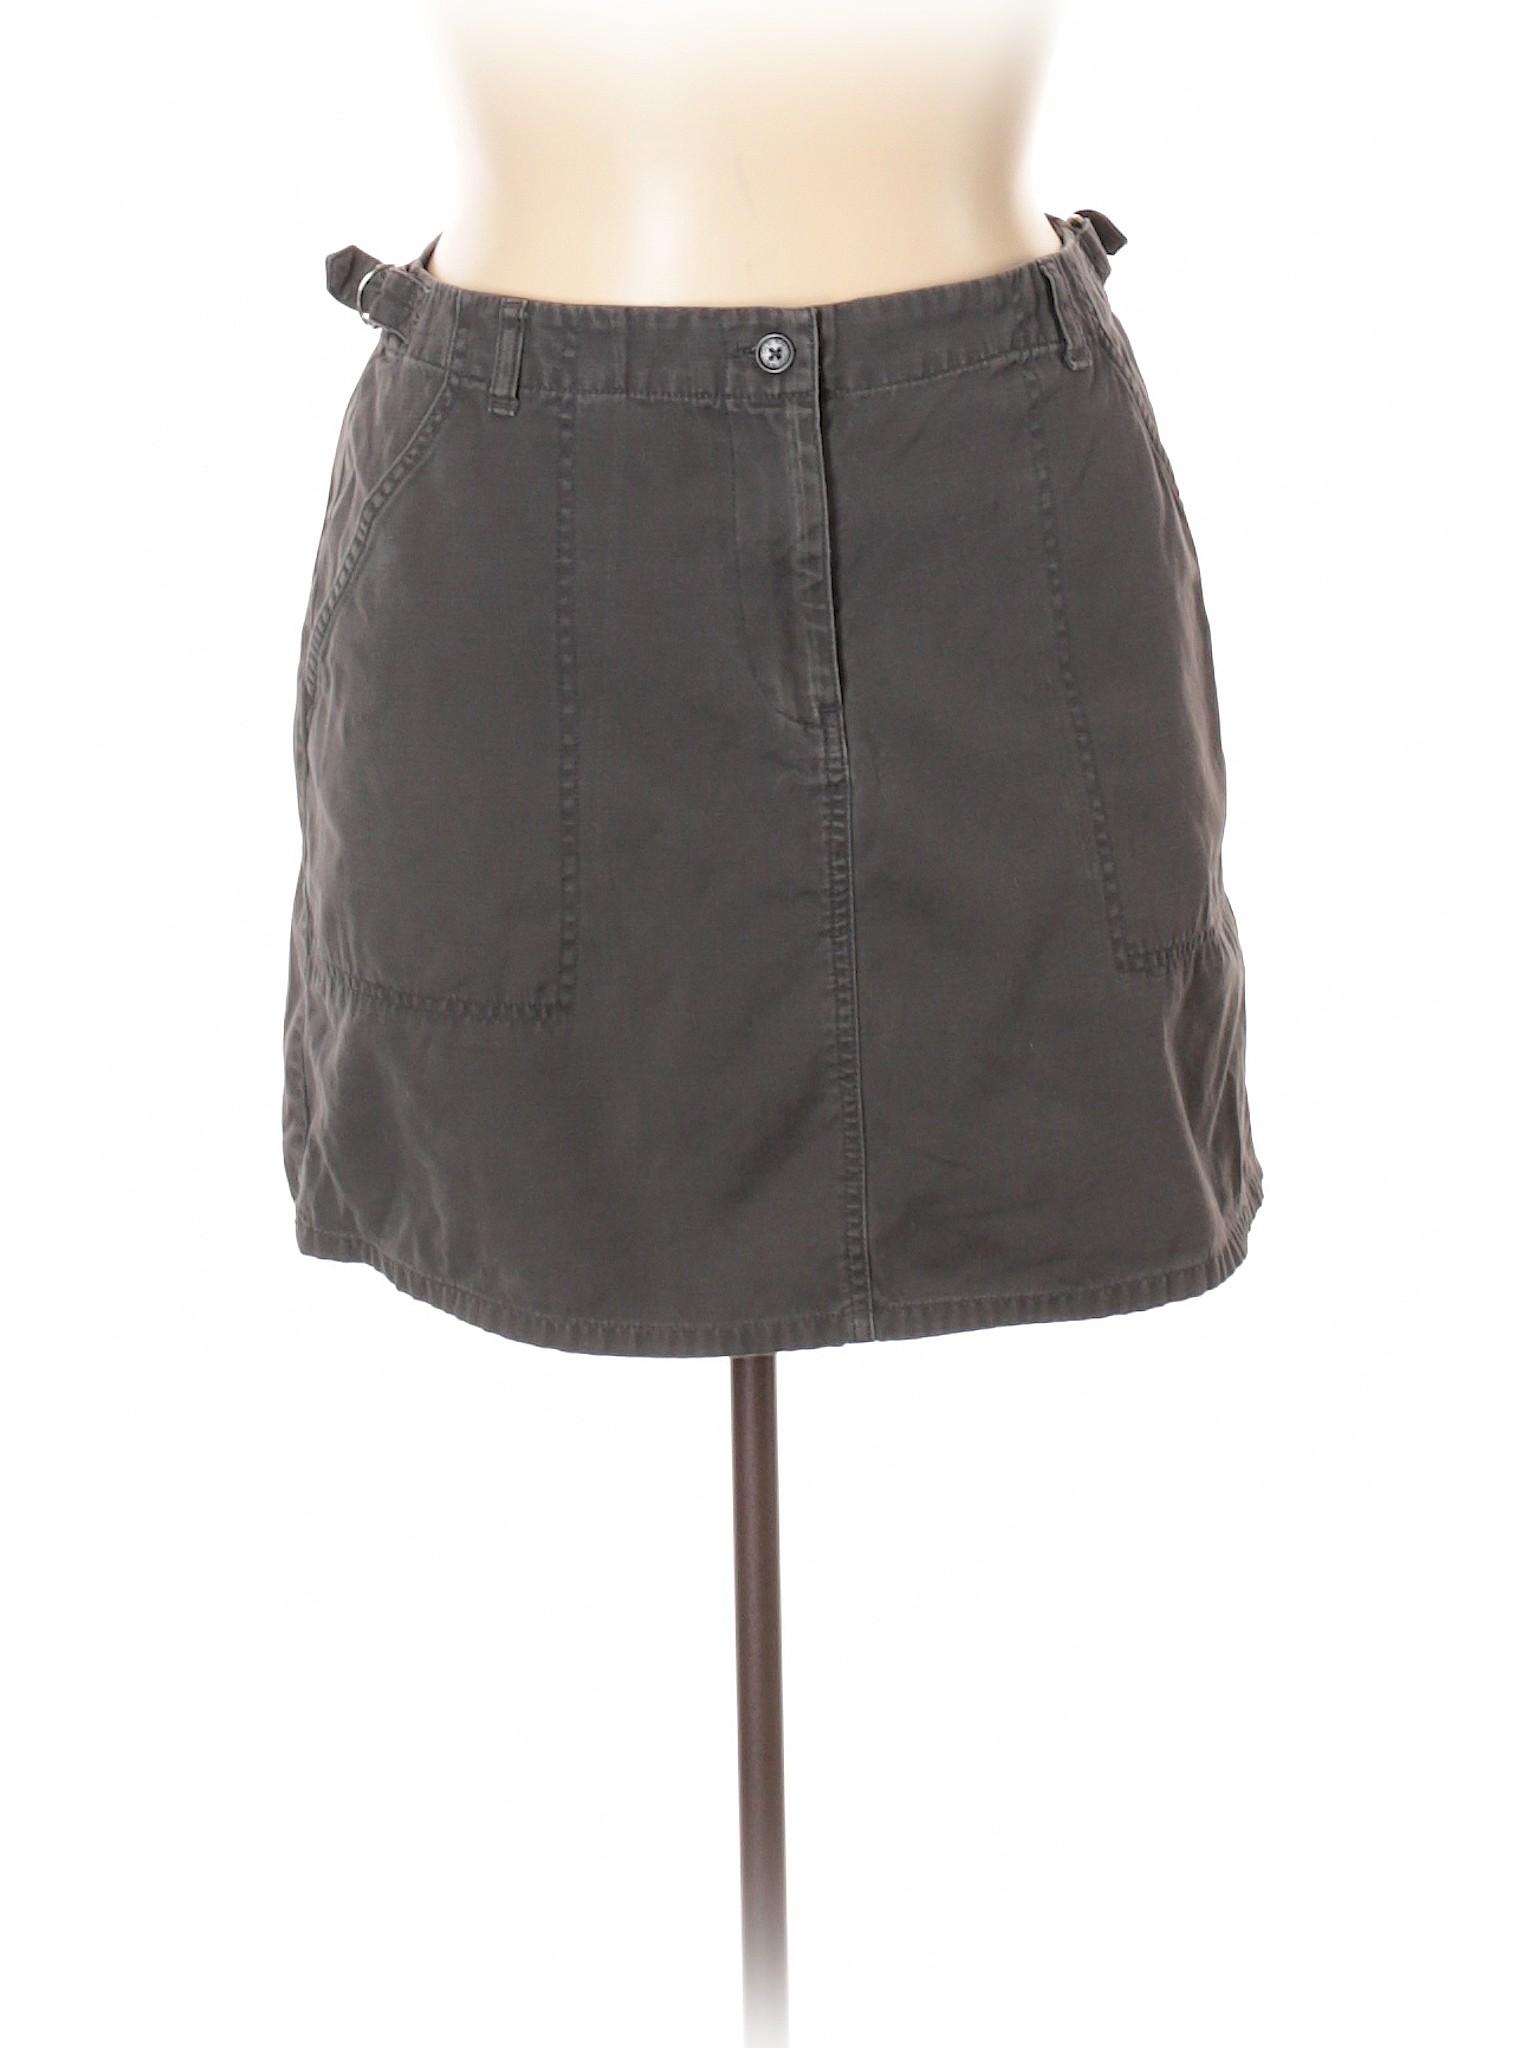 Winter Navy Old Skirt Casual Leisure vHdxUv